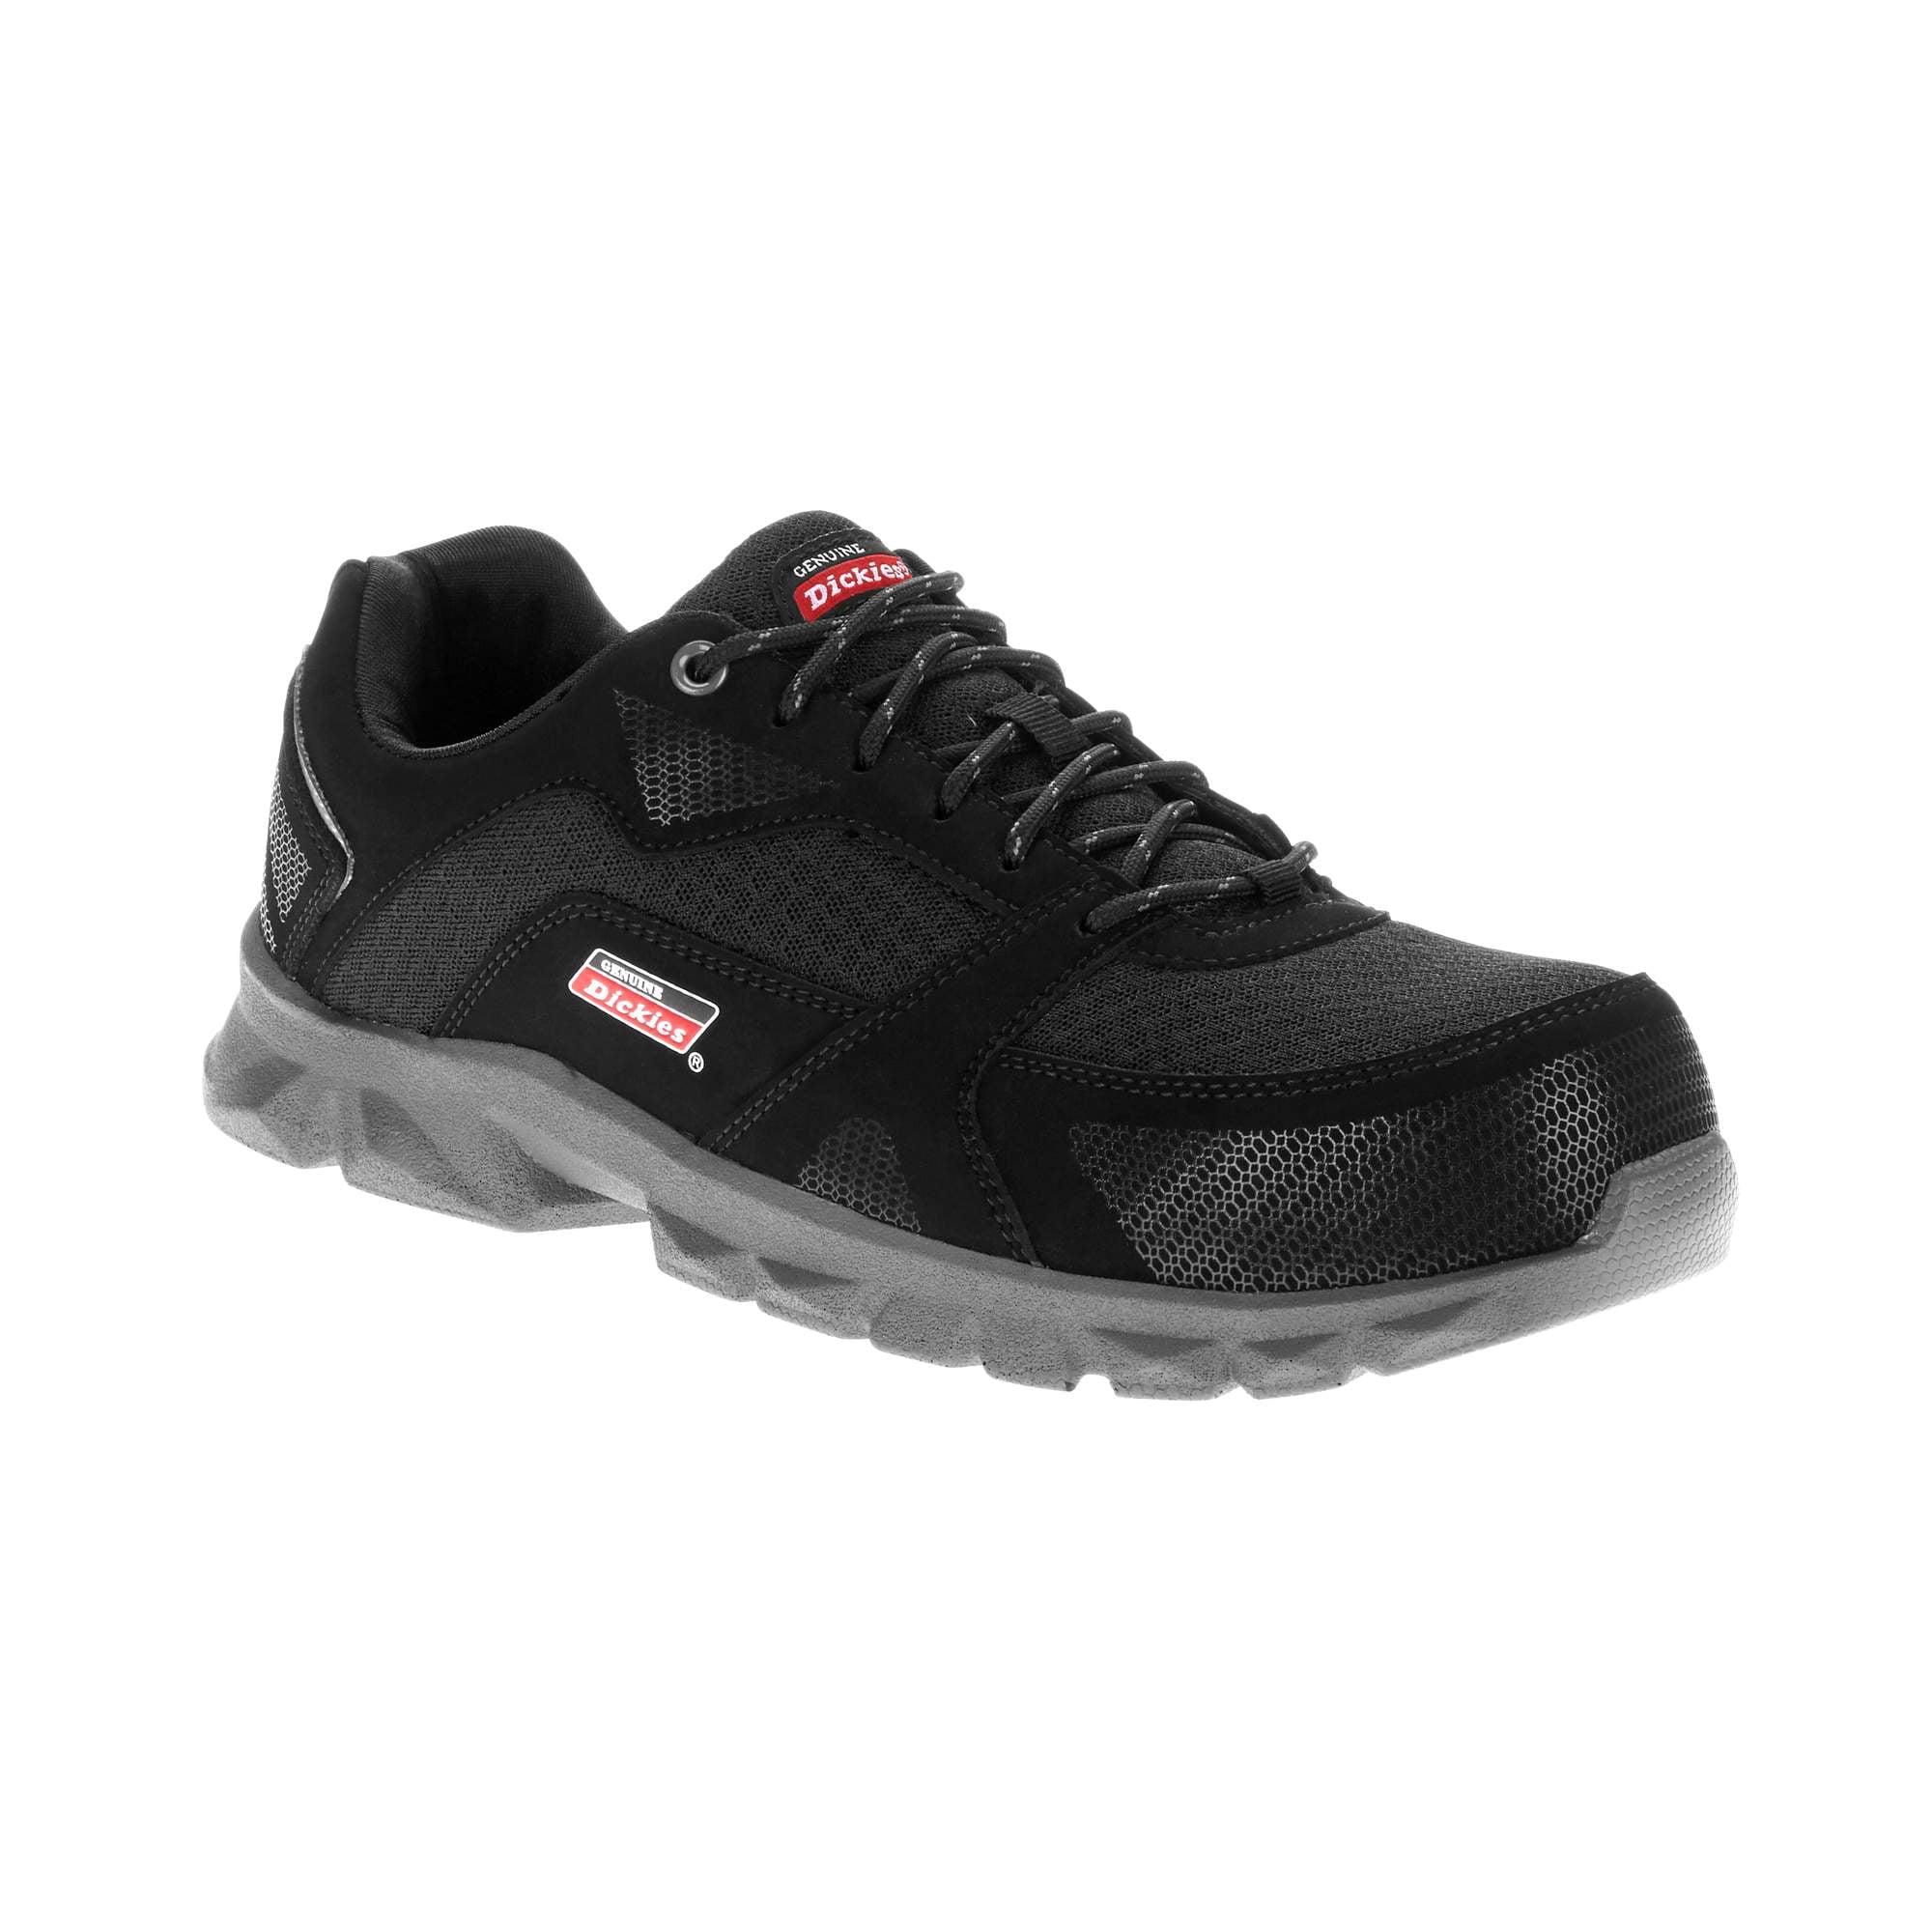 Genuine Dickies Men's Jobrated Brakk Work Shoe